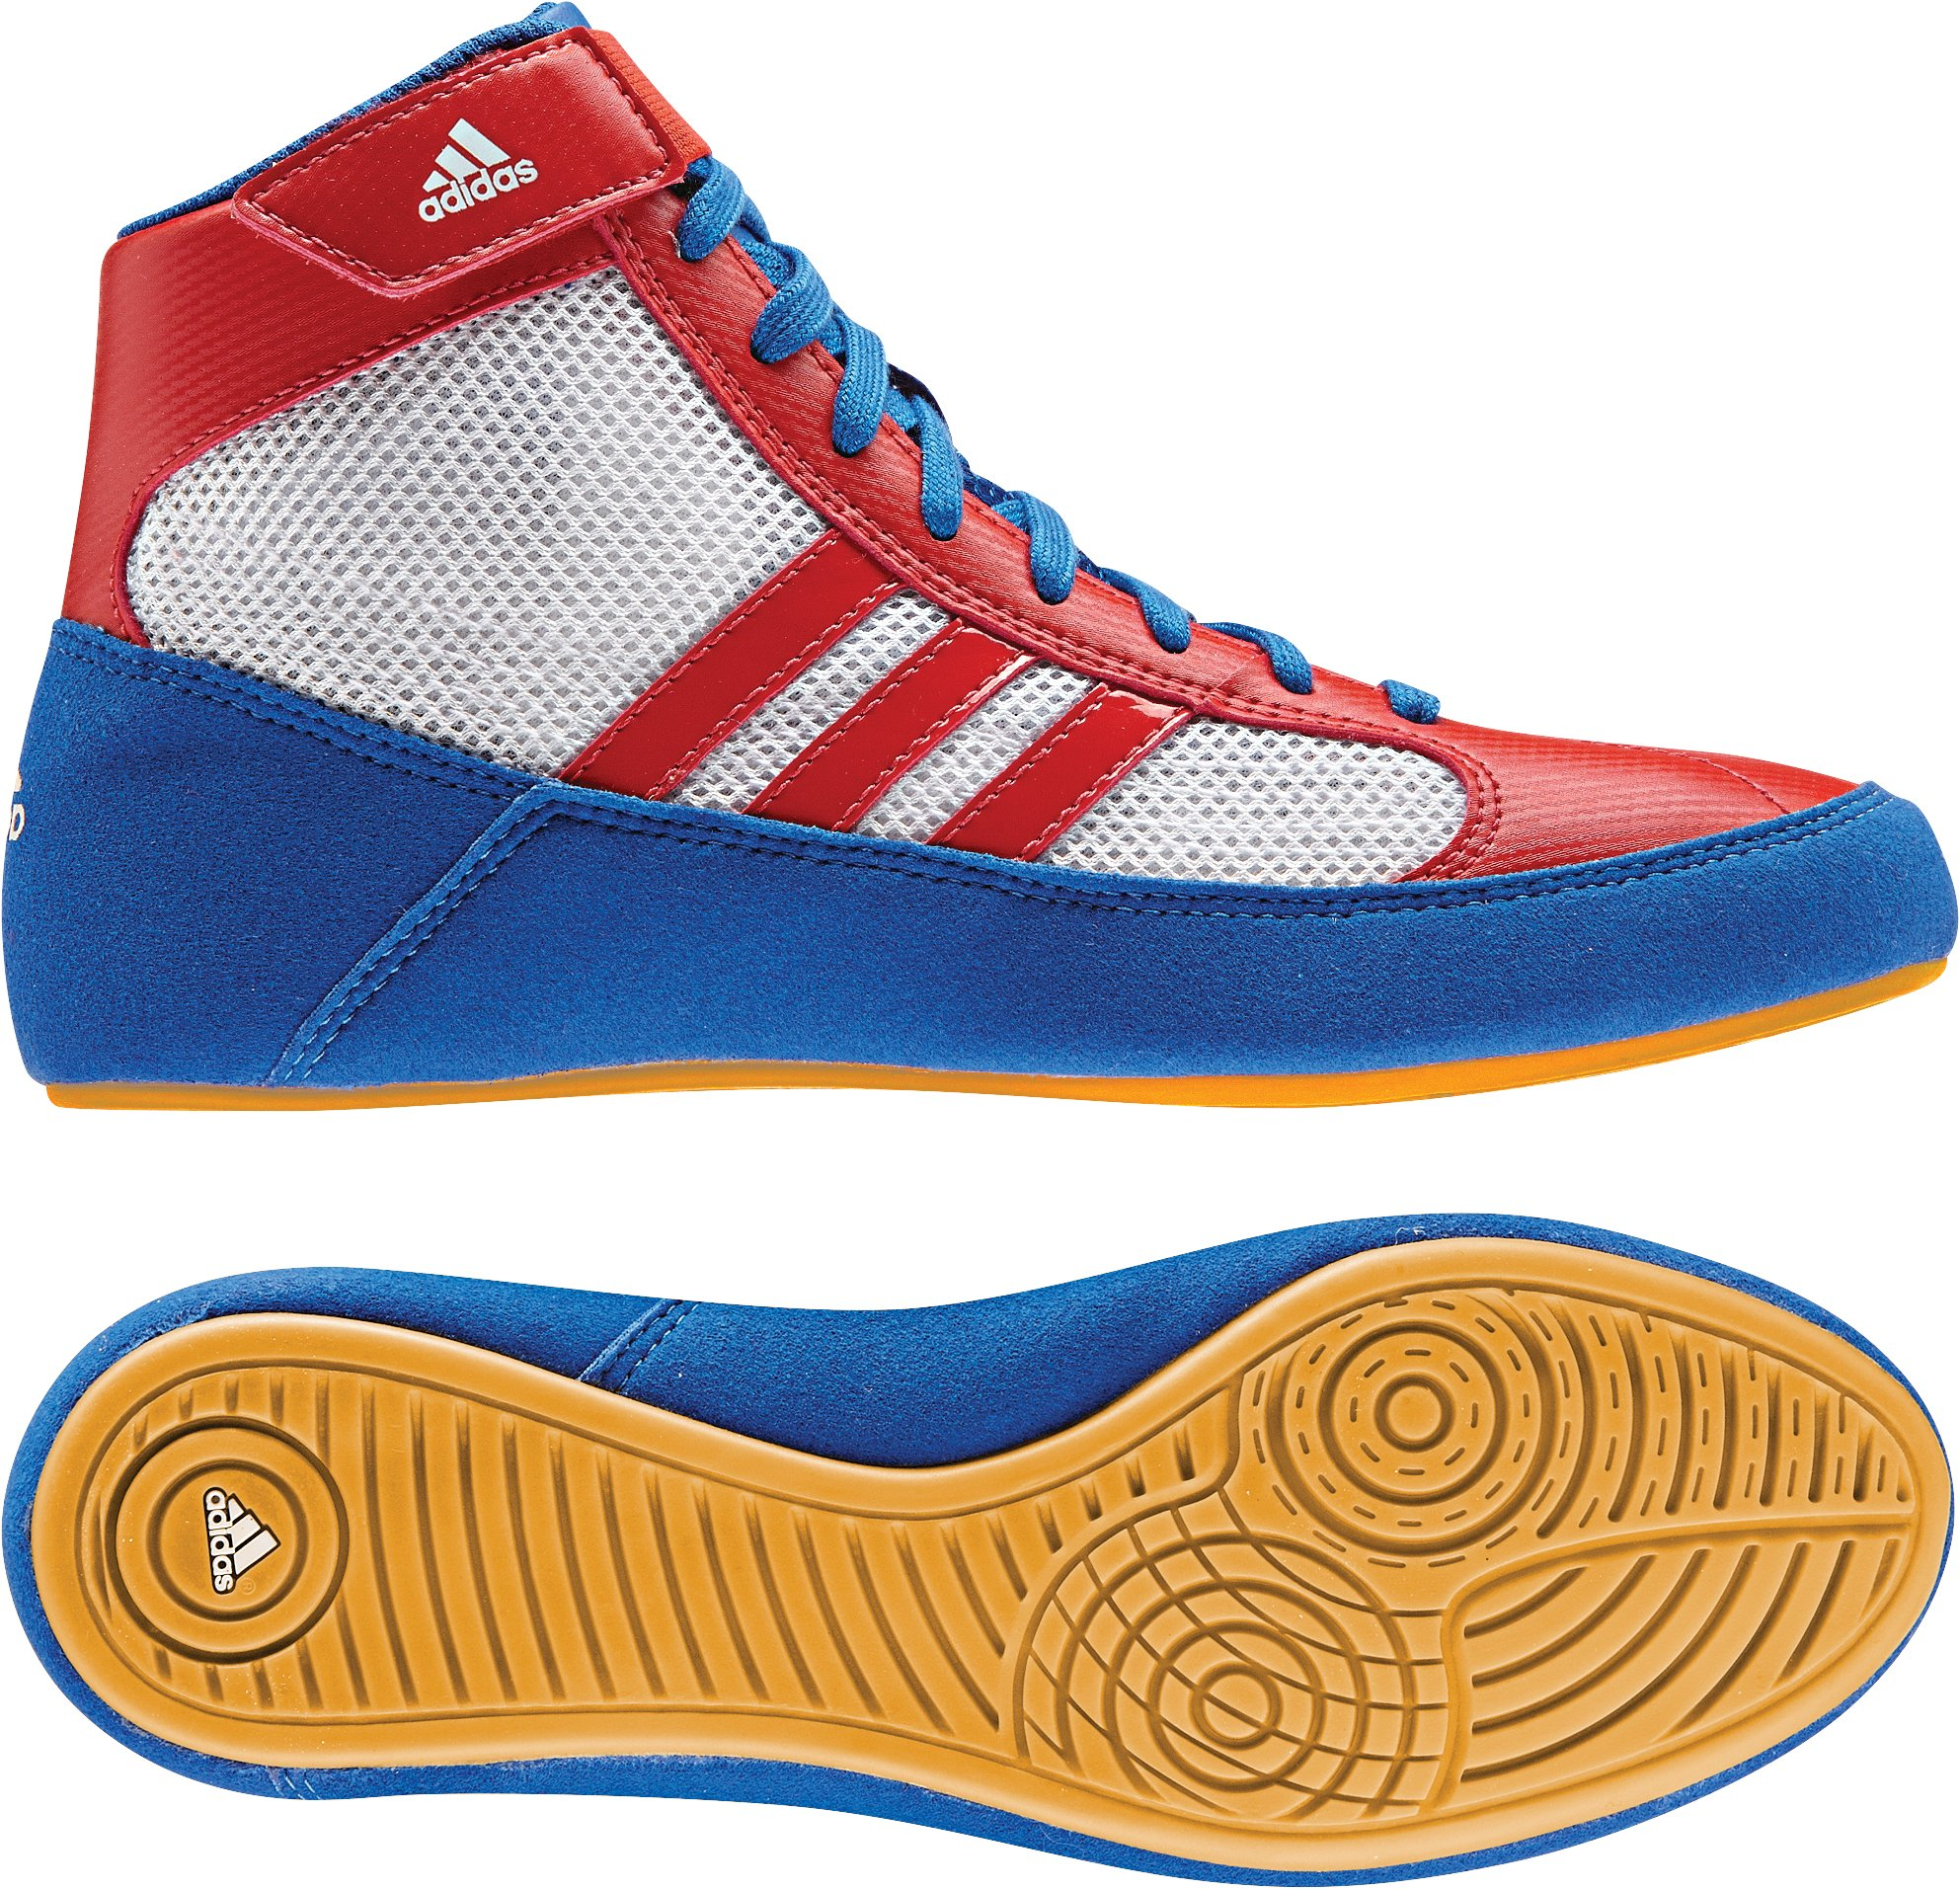 Adidas HVC 2 Wrestling Shoe, Blue/Red/White, 11.5 M US